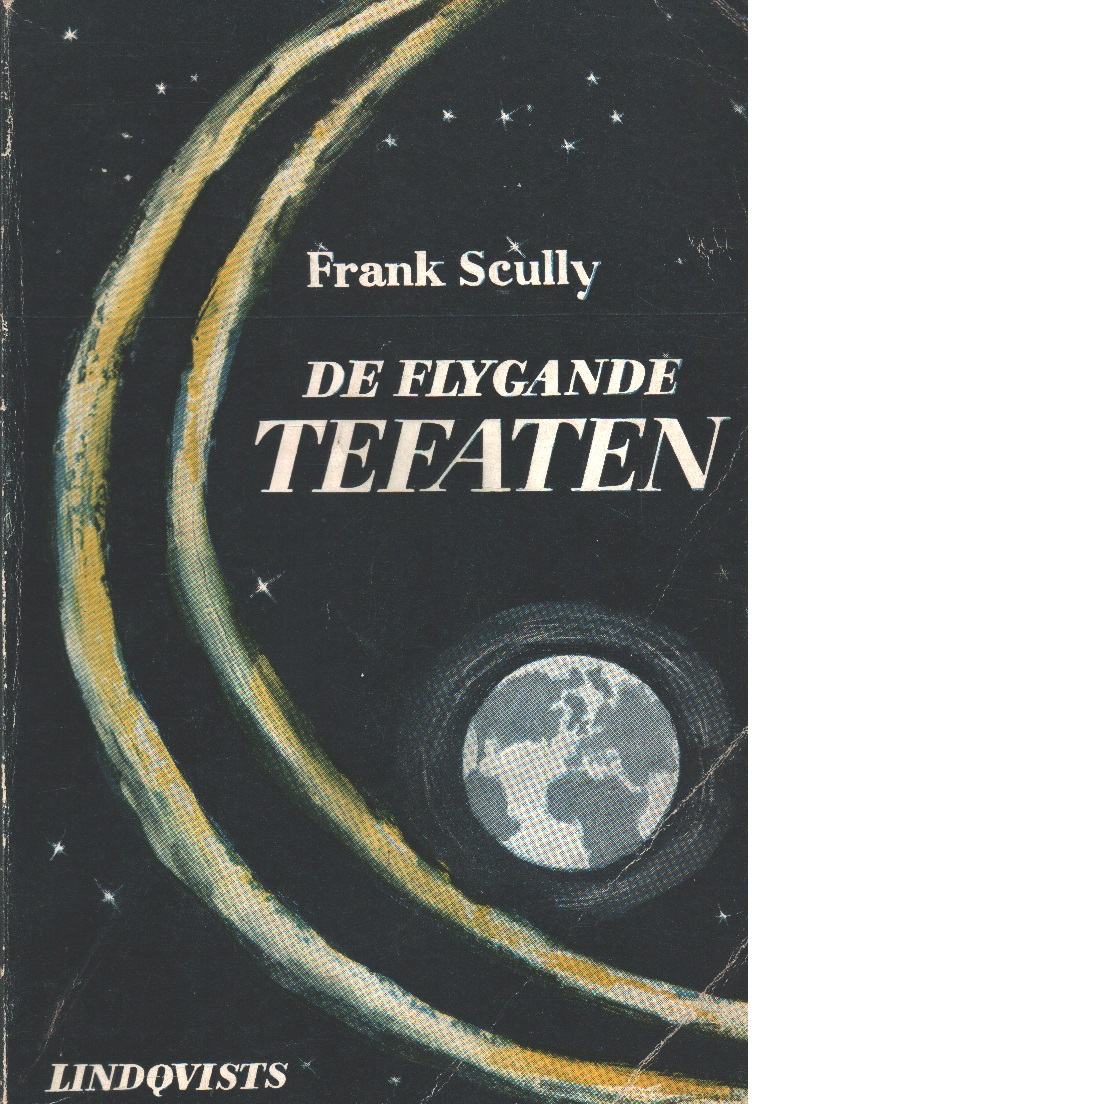 De flygande tefaten - Scully, Frank